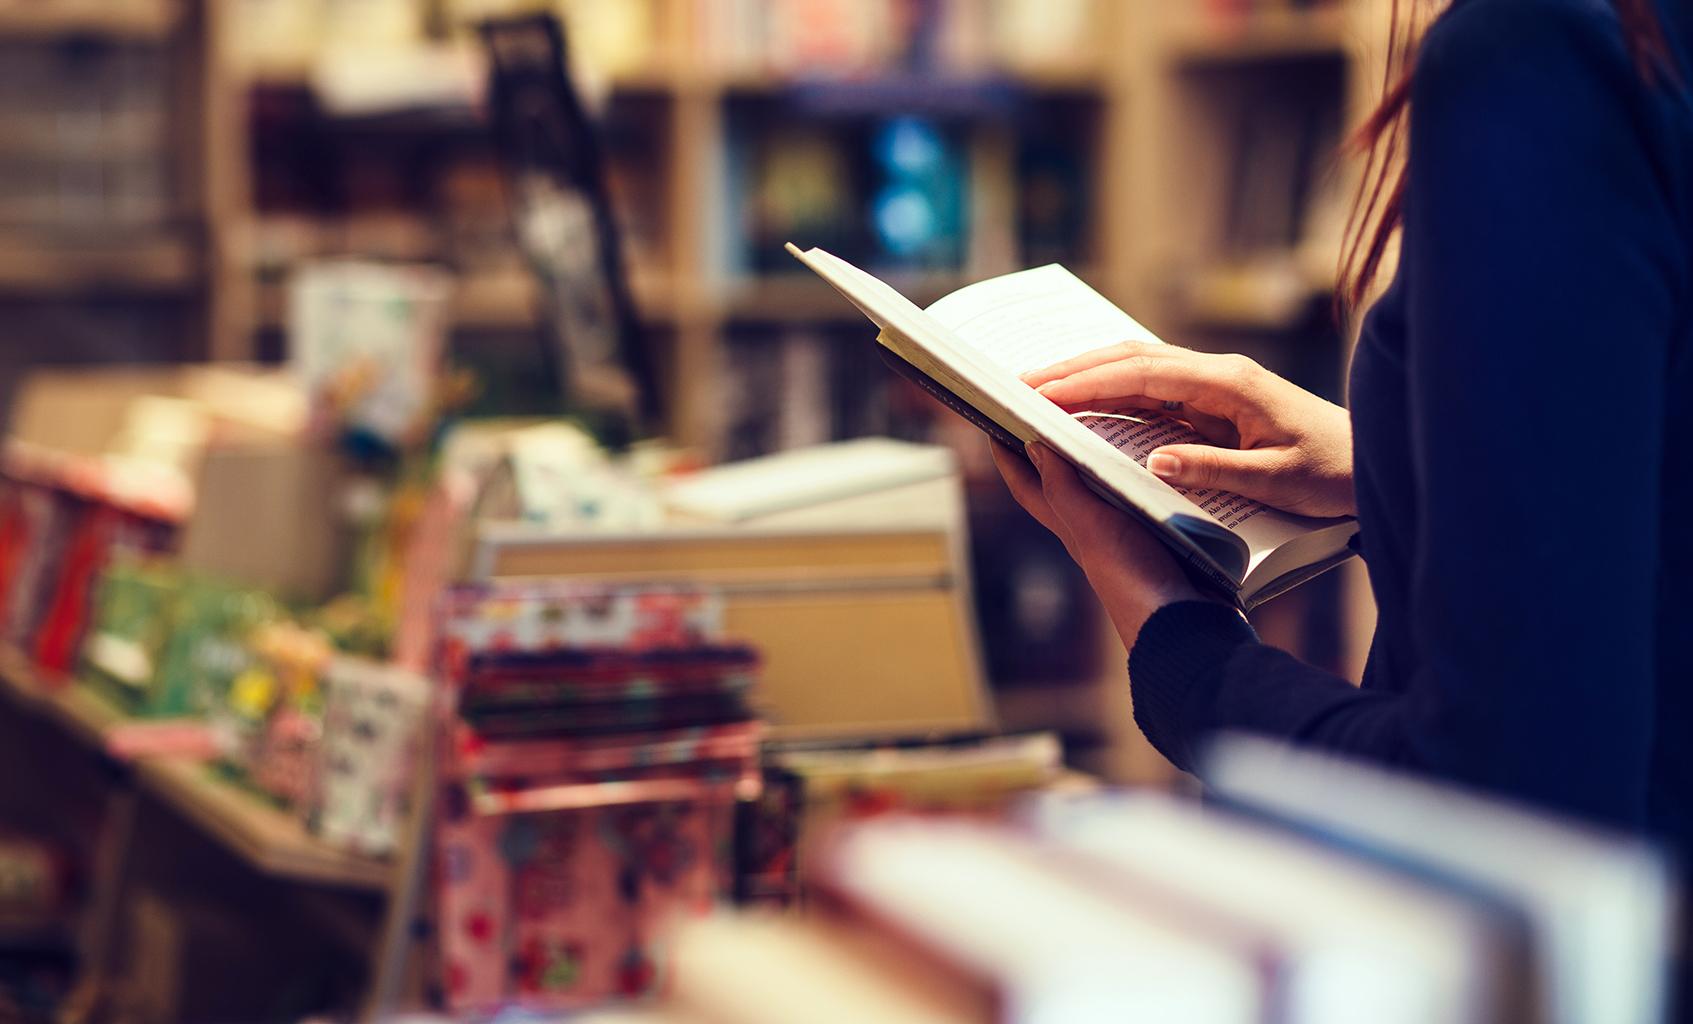 Lady holding an open book inside bookshop